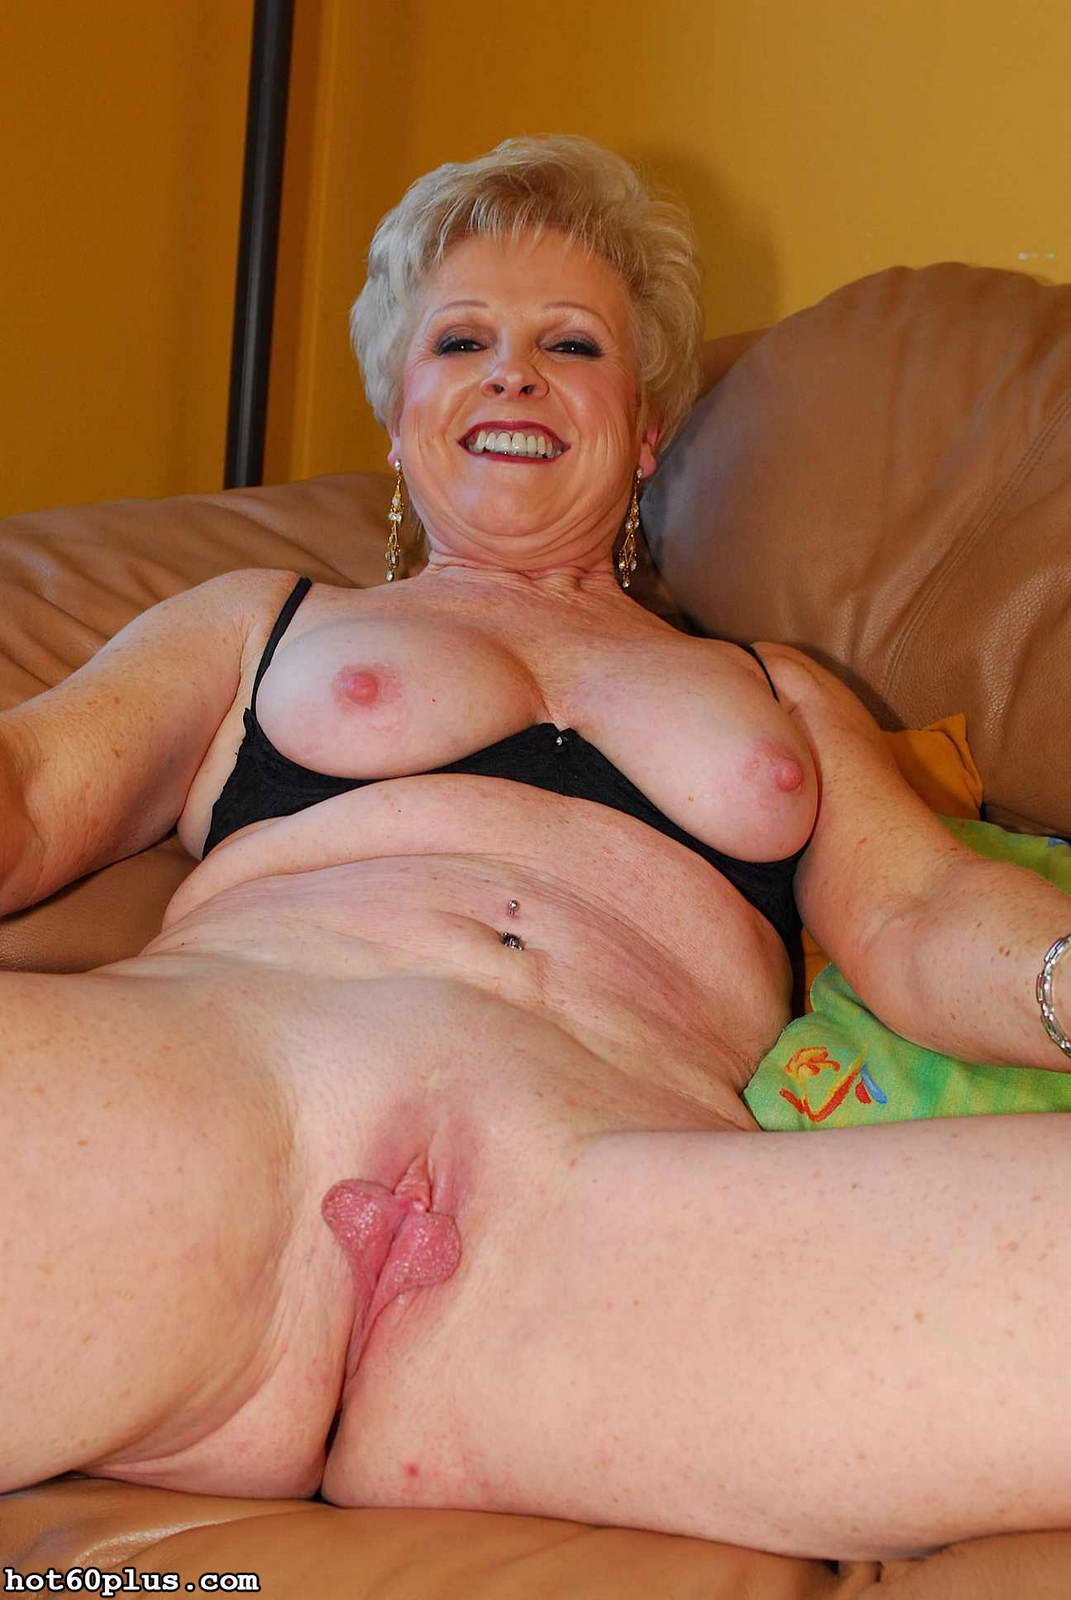 New look erotic artistic blowjob